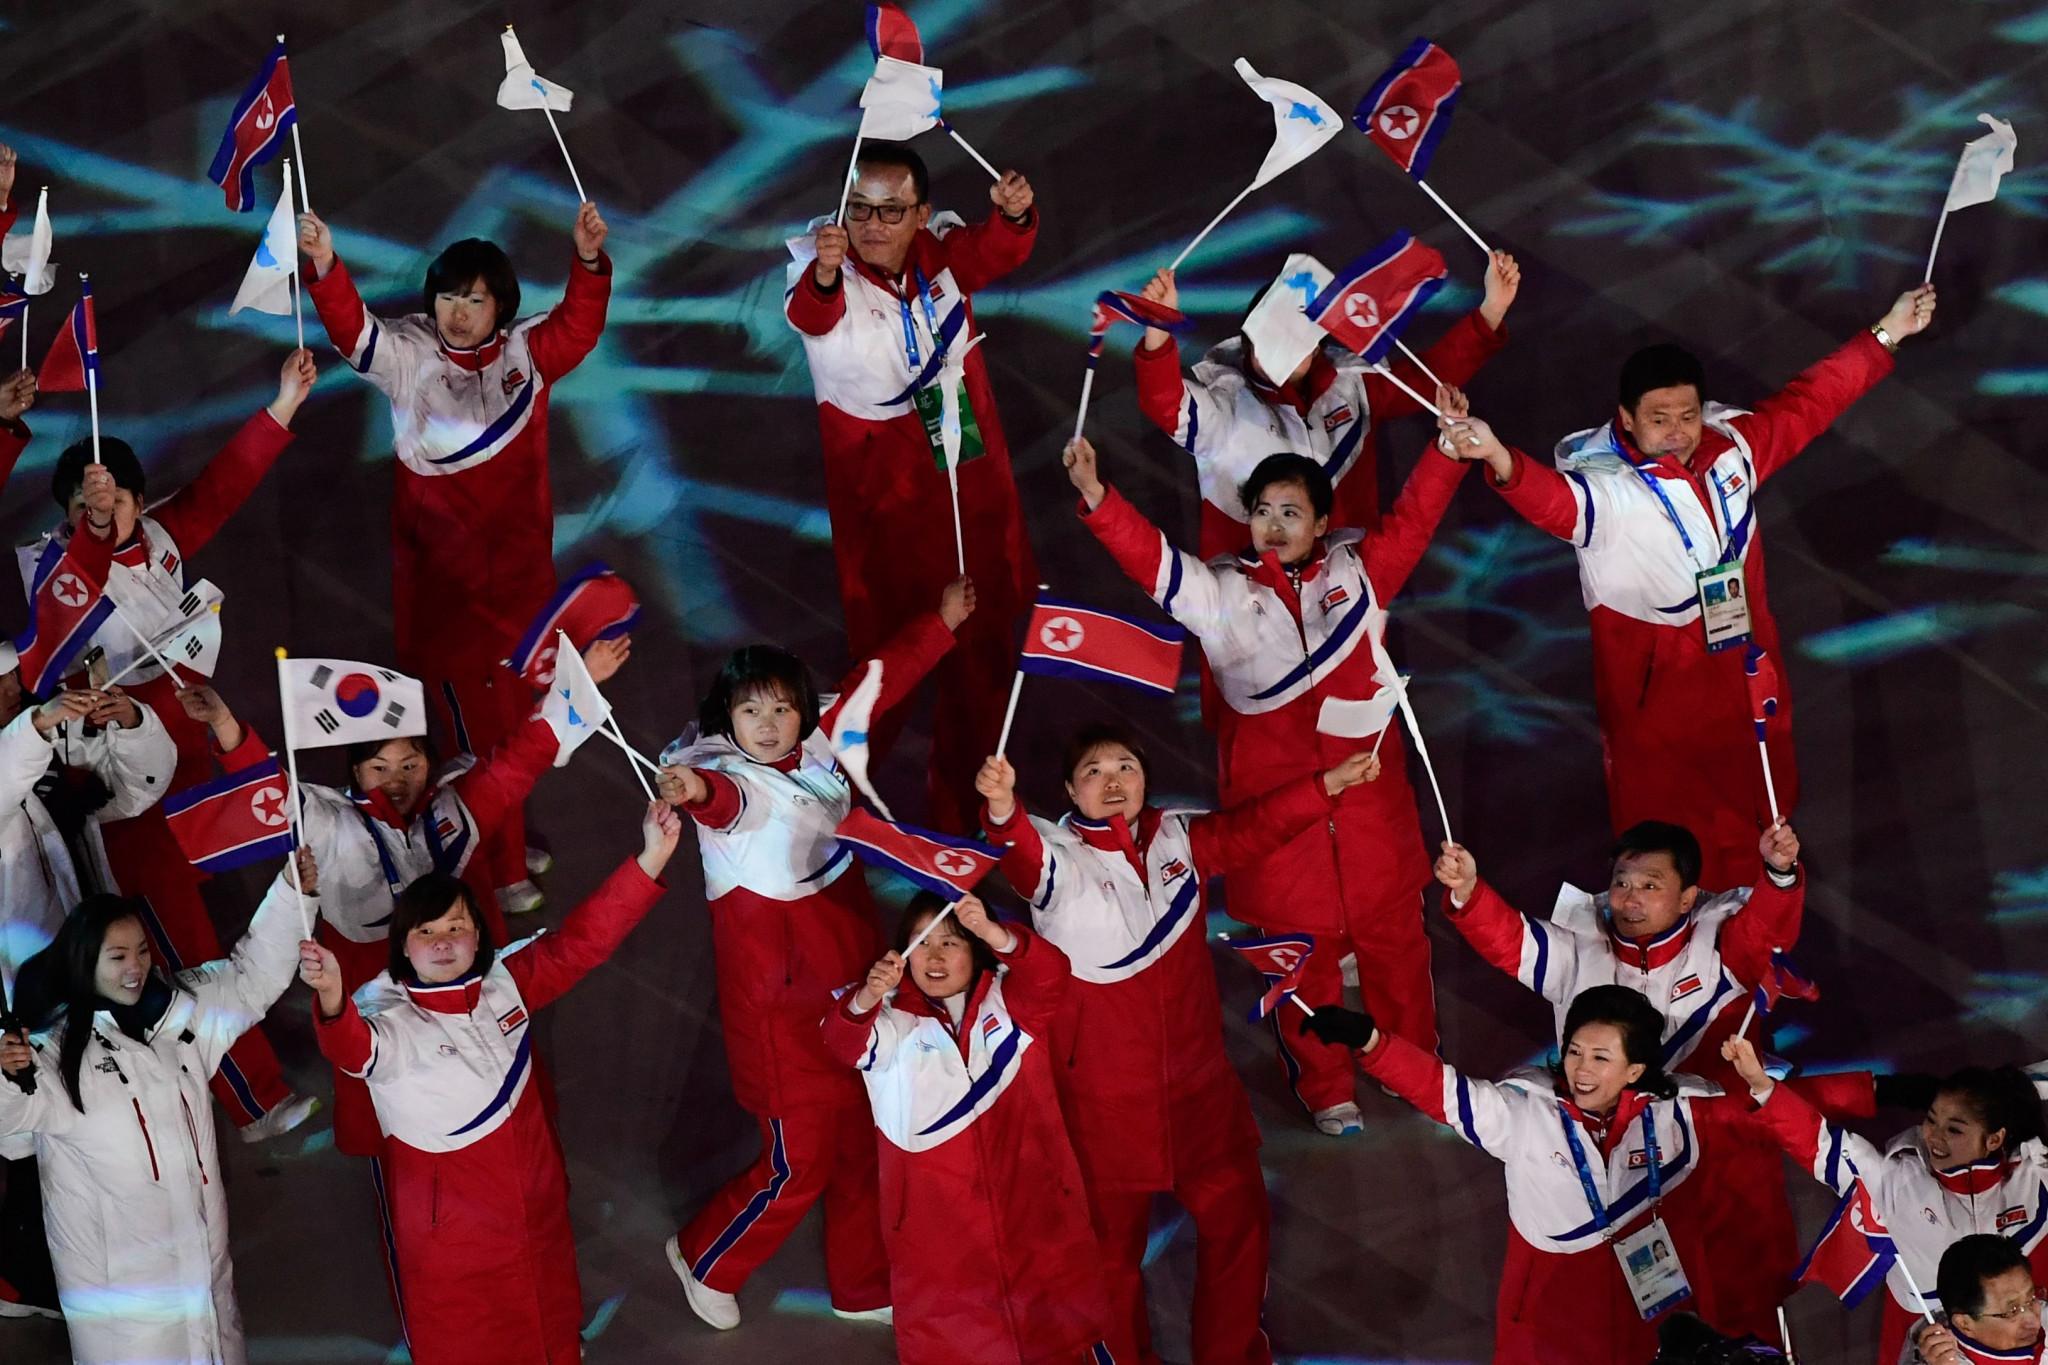 Gangwon 2024 secretary general still hopes for North Korean involvement at Youth Olympics